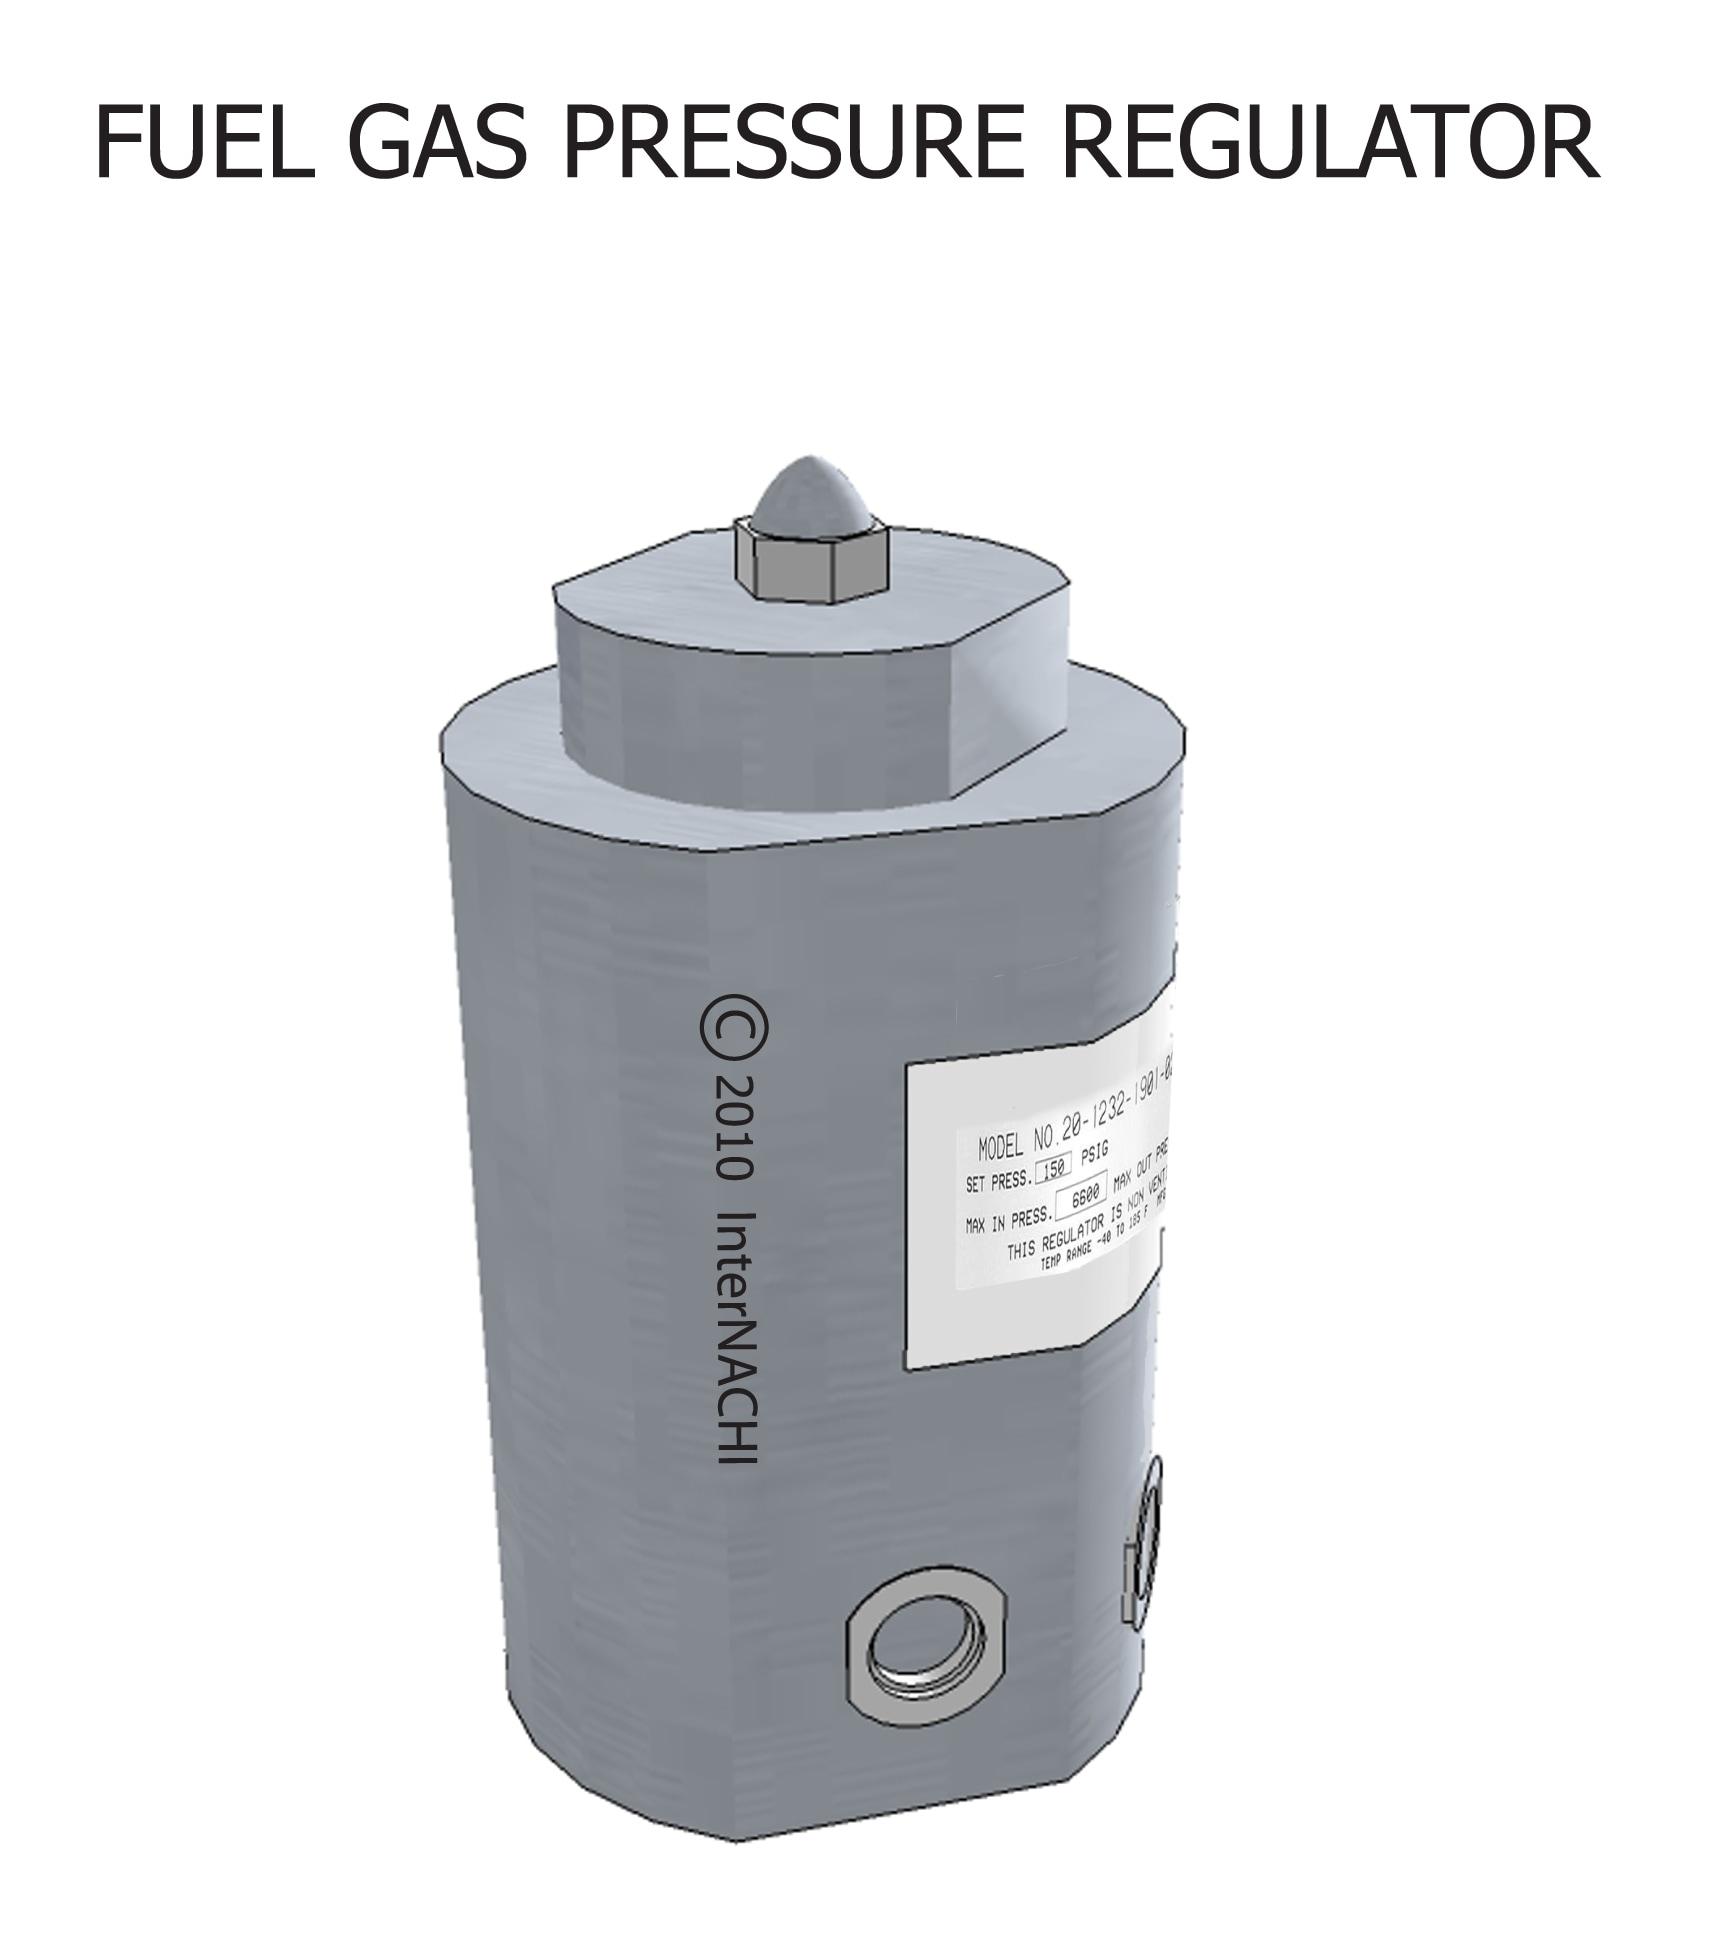 Fuel gas pressure regulator.